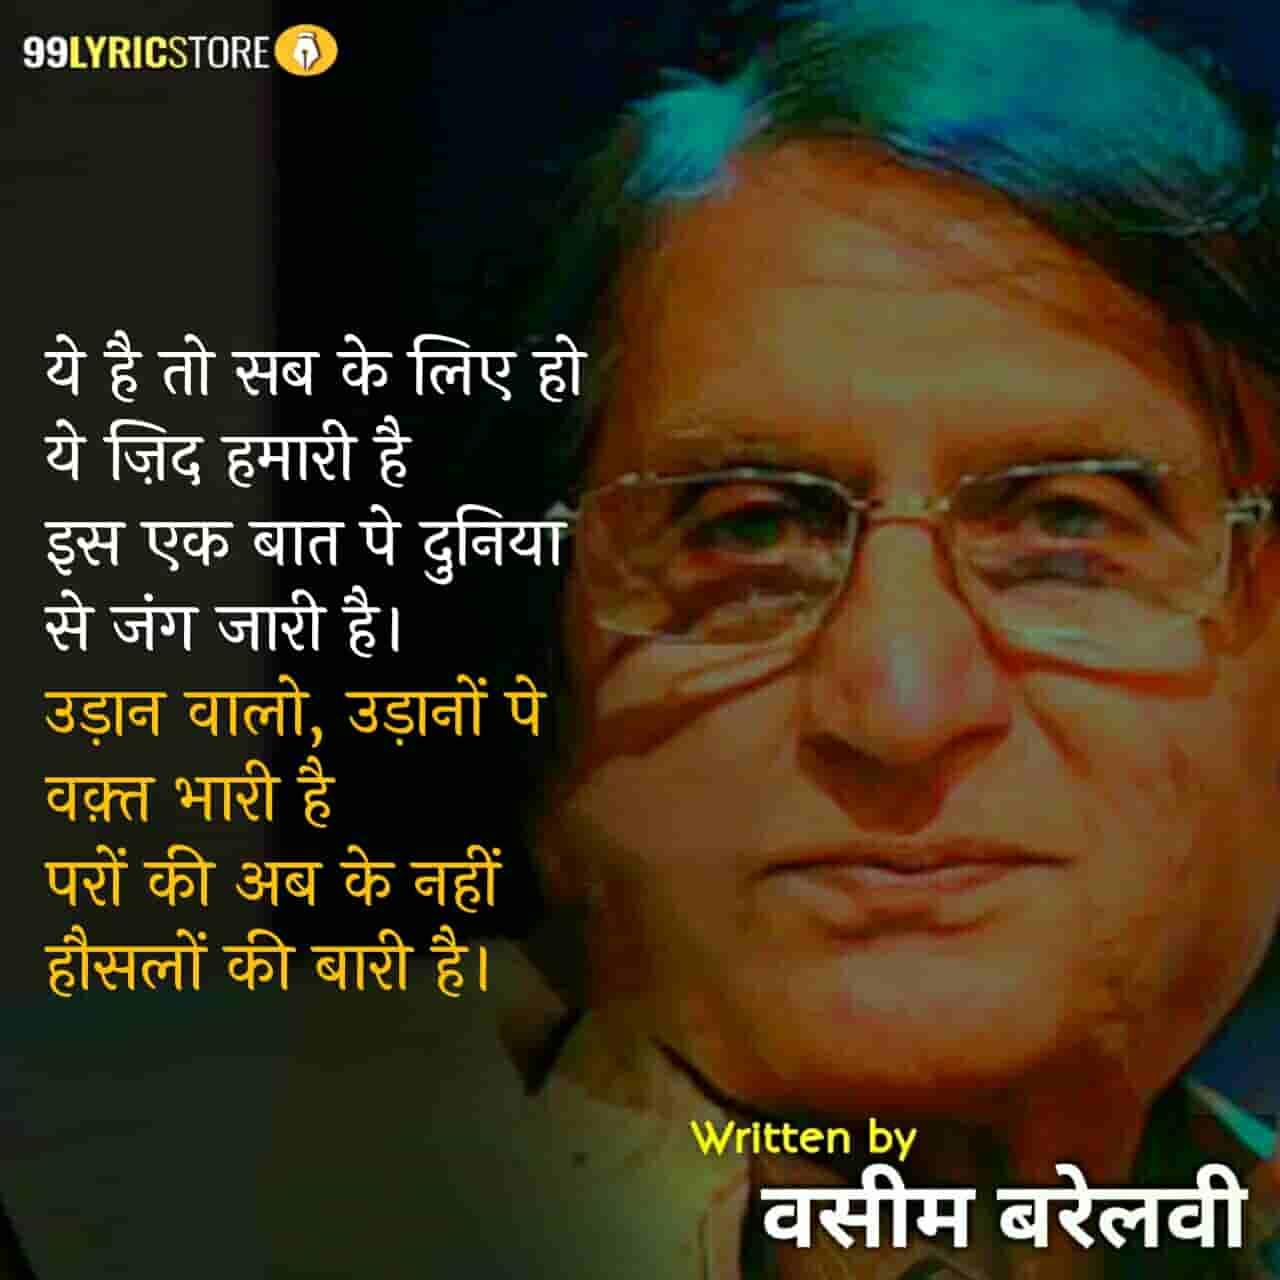 This beautiful Ghazal 'Ye Hain Toh Sab Ke Liye Ho' has written by Waseem Barelvi.